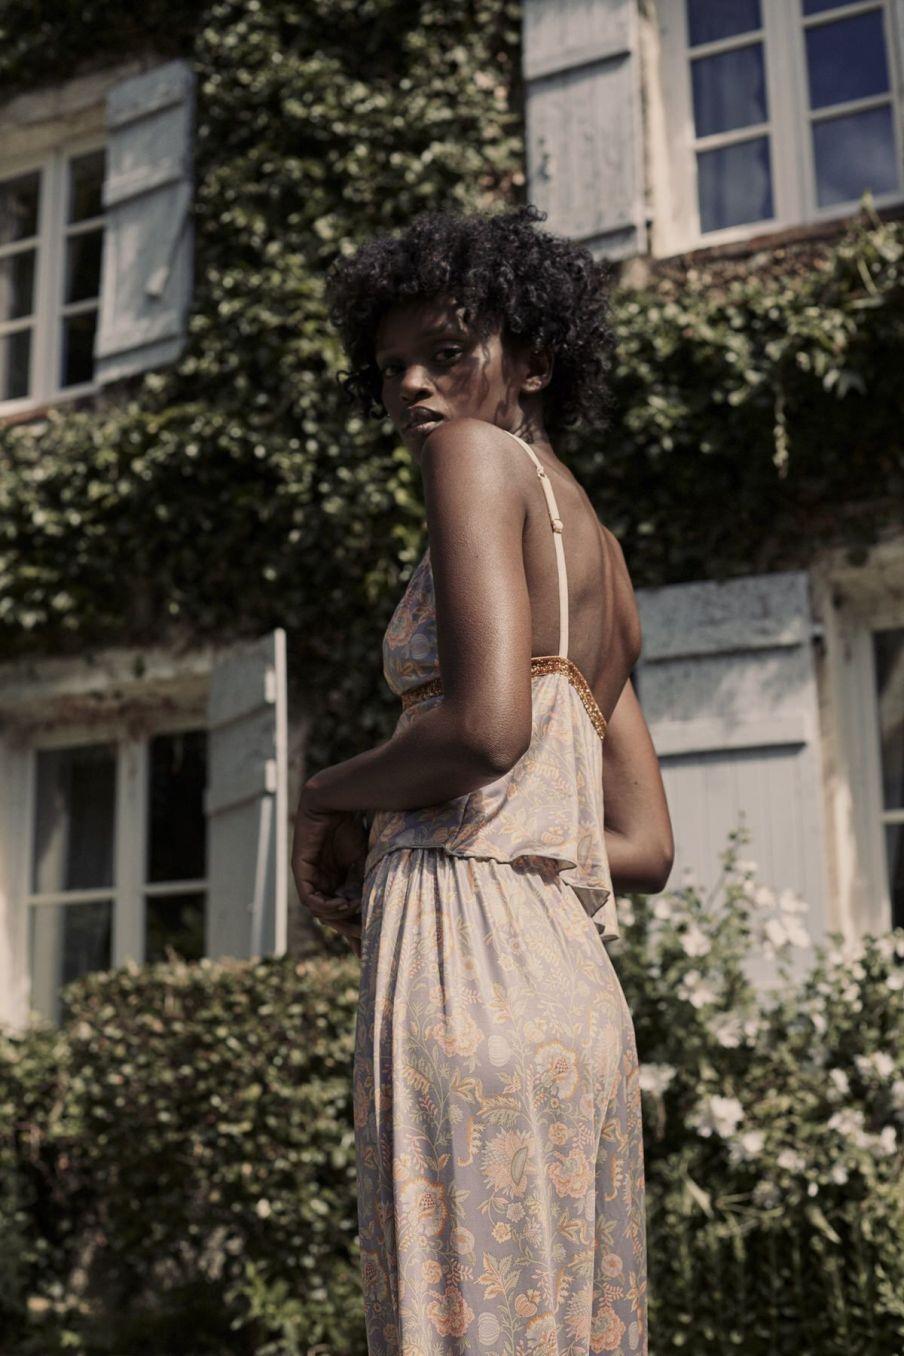 boheme chic vintage bas de pyjama femme melicia grey california flowers